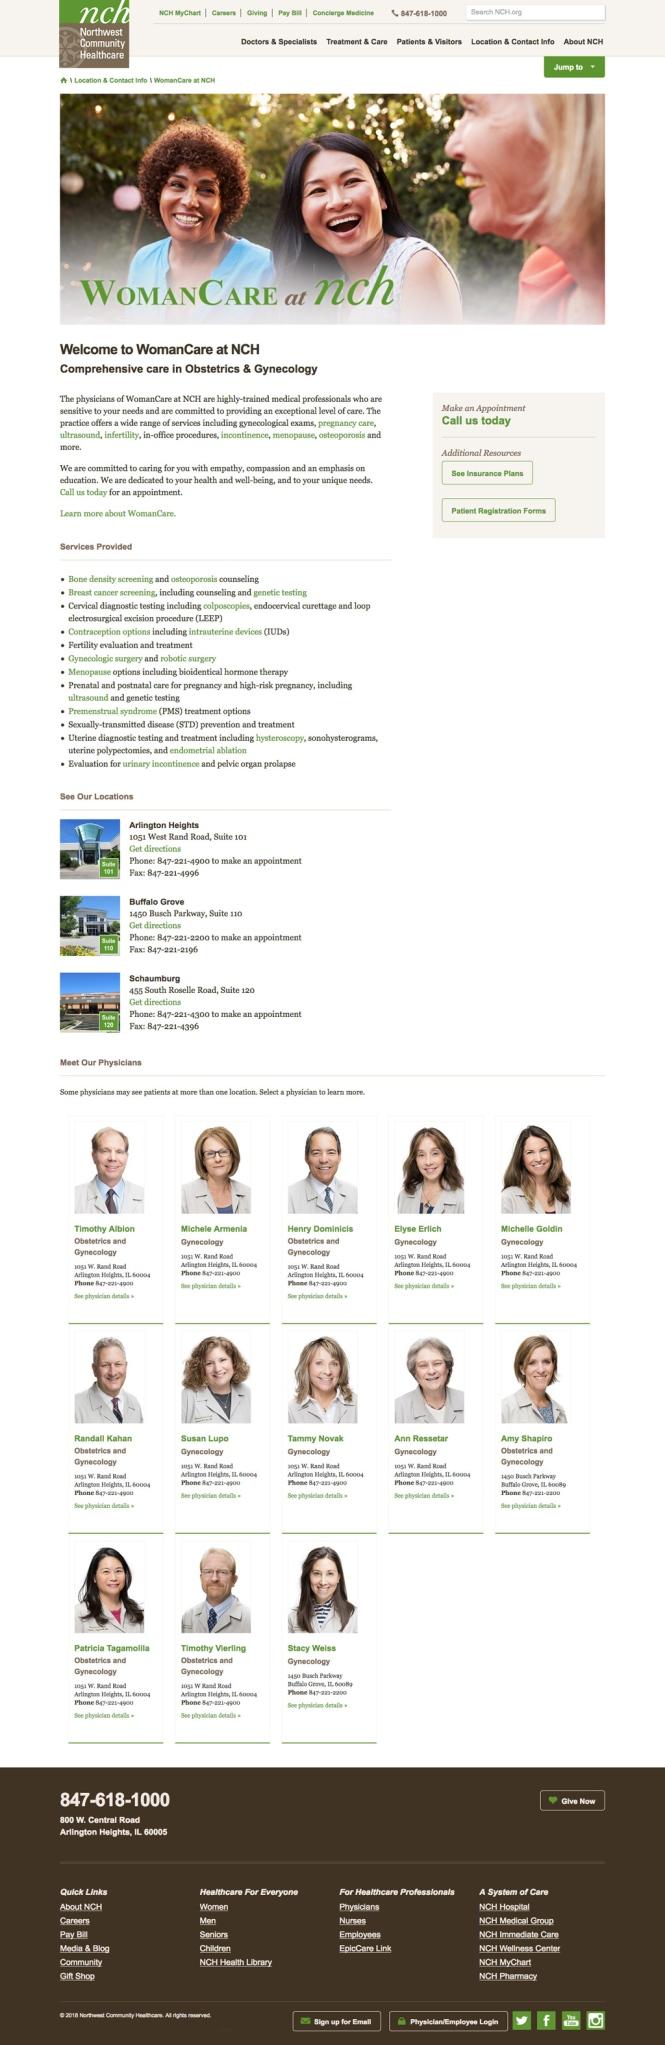 womancare_landing_page.jpg